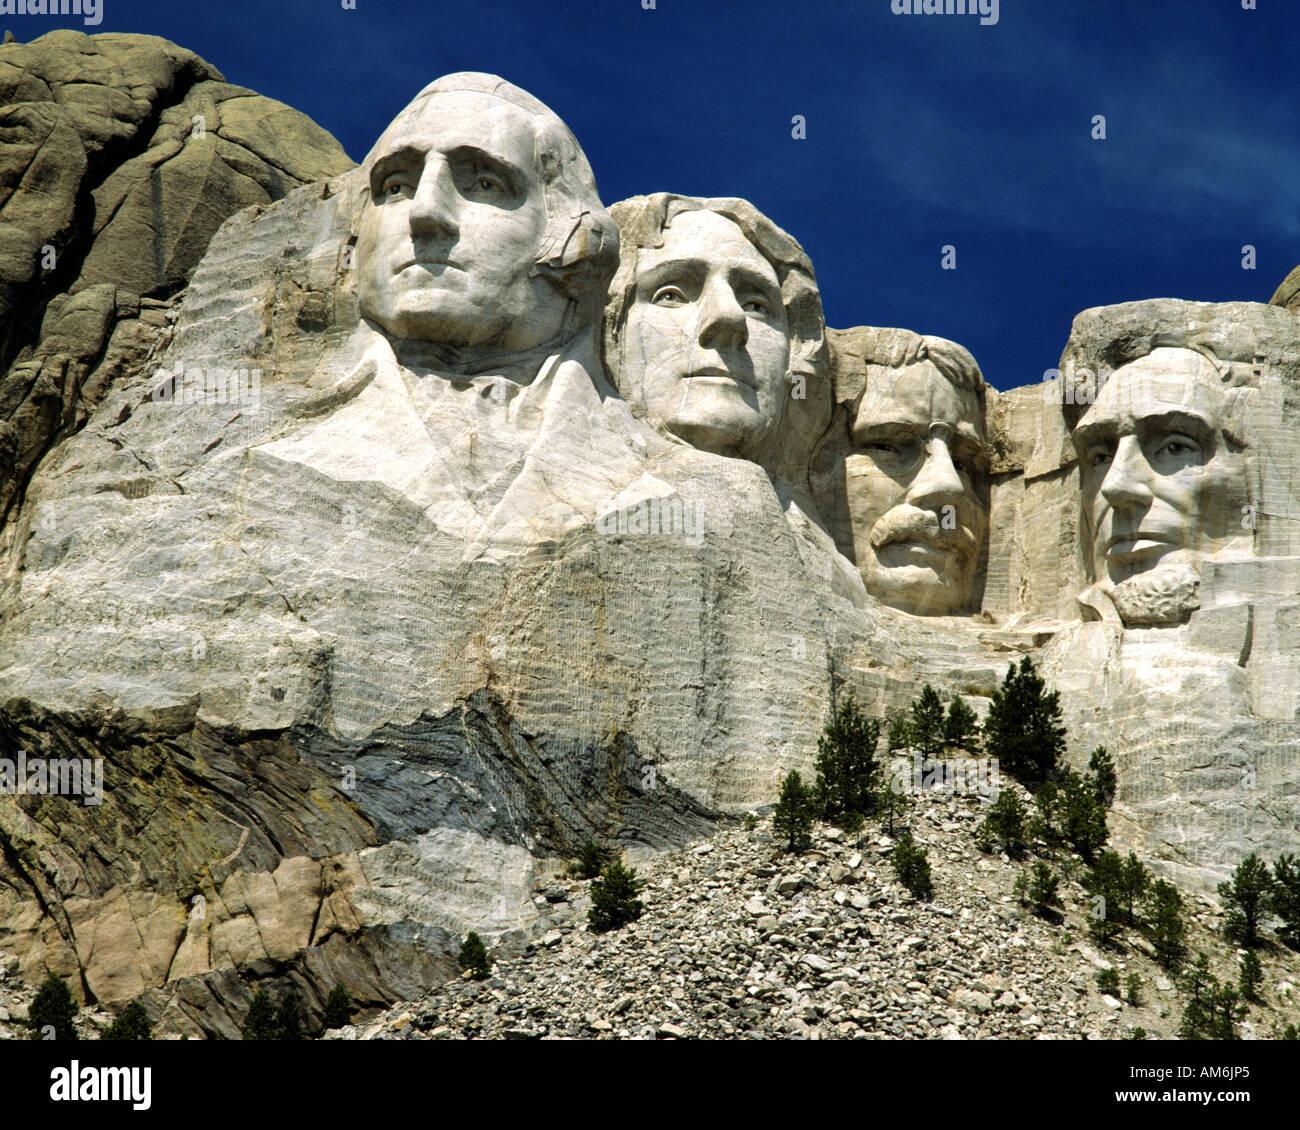 USA - SOUTH DAKOTA:  Mount Rushmore National Memorial Stock Photo